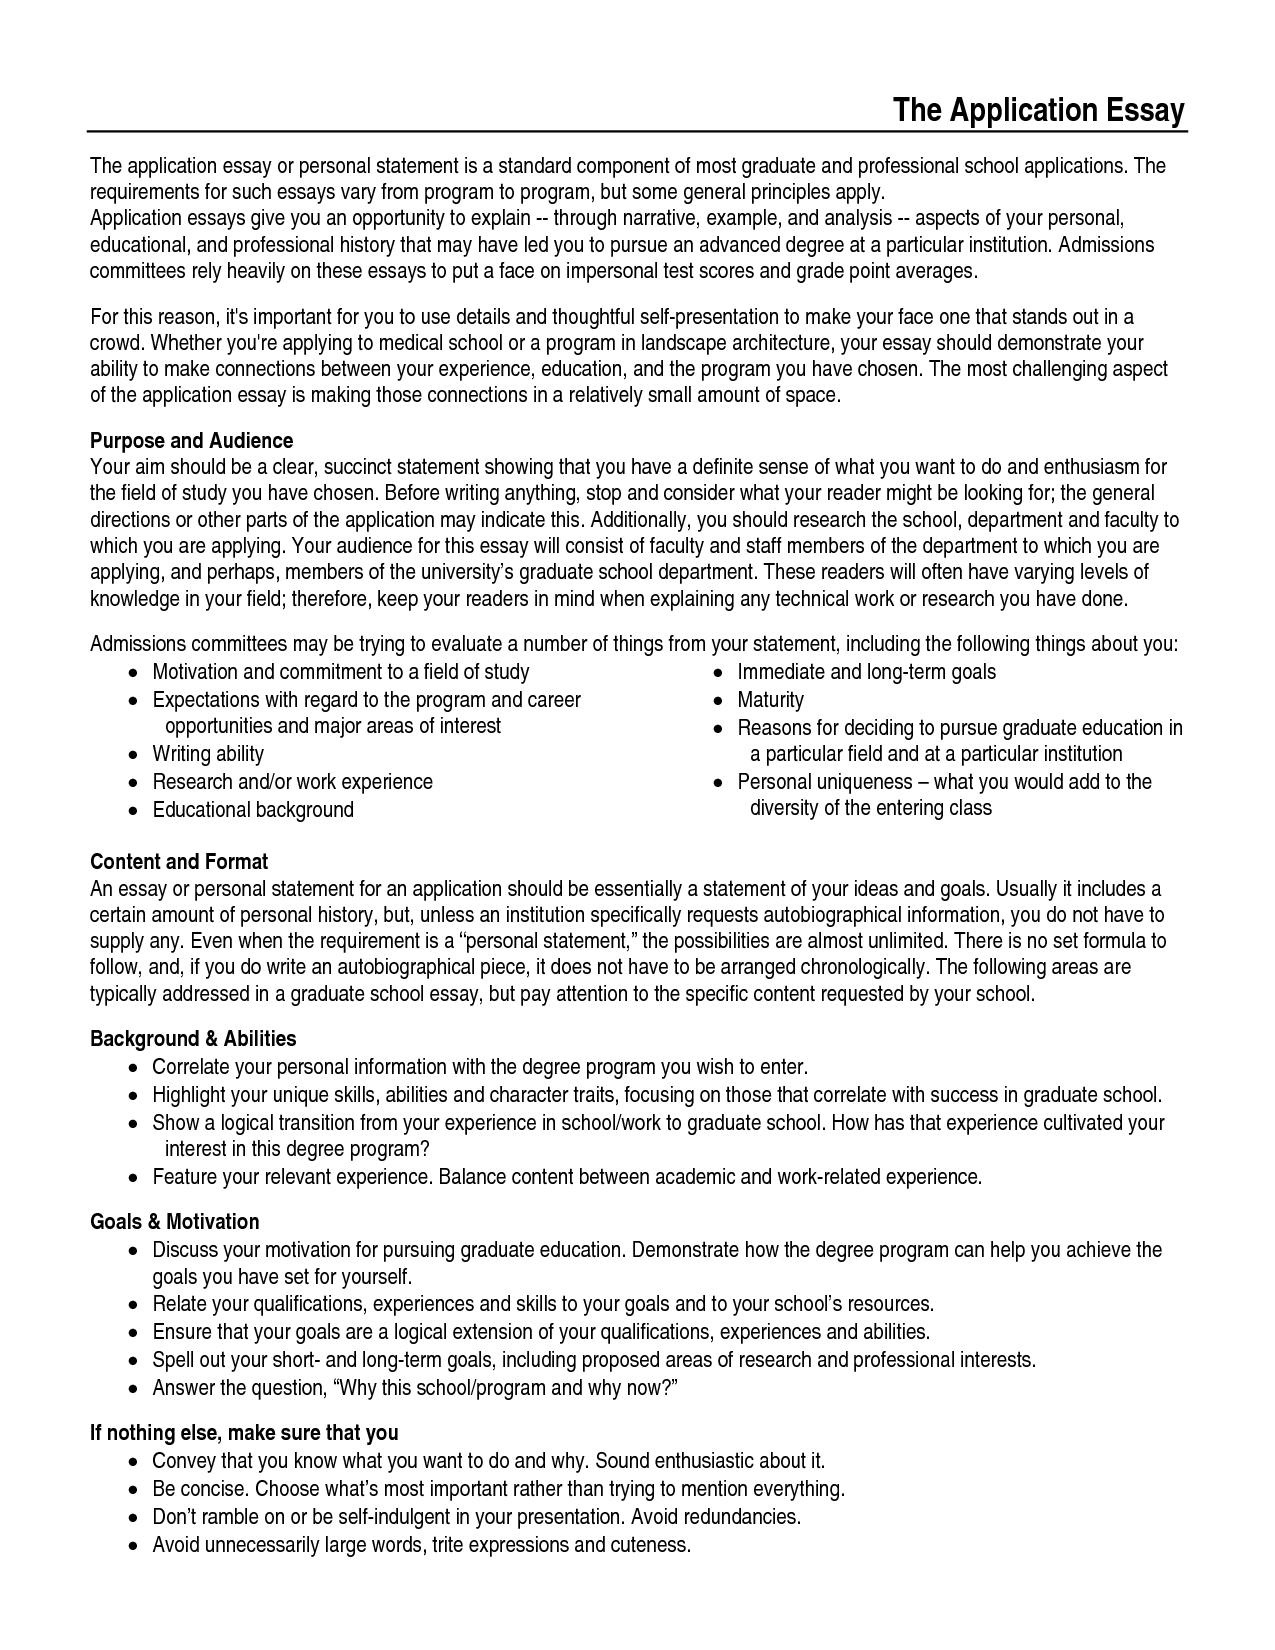 016 Jobs Essay Writing Homework Academic Service Freelance India Qla4y Uk Online Archaicawful In Kenya Full